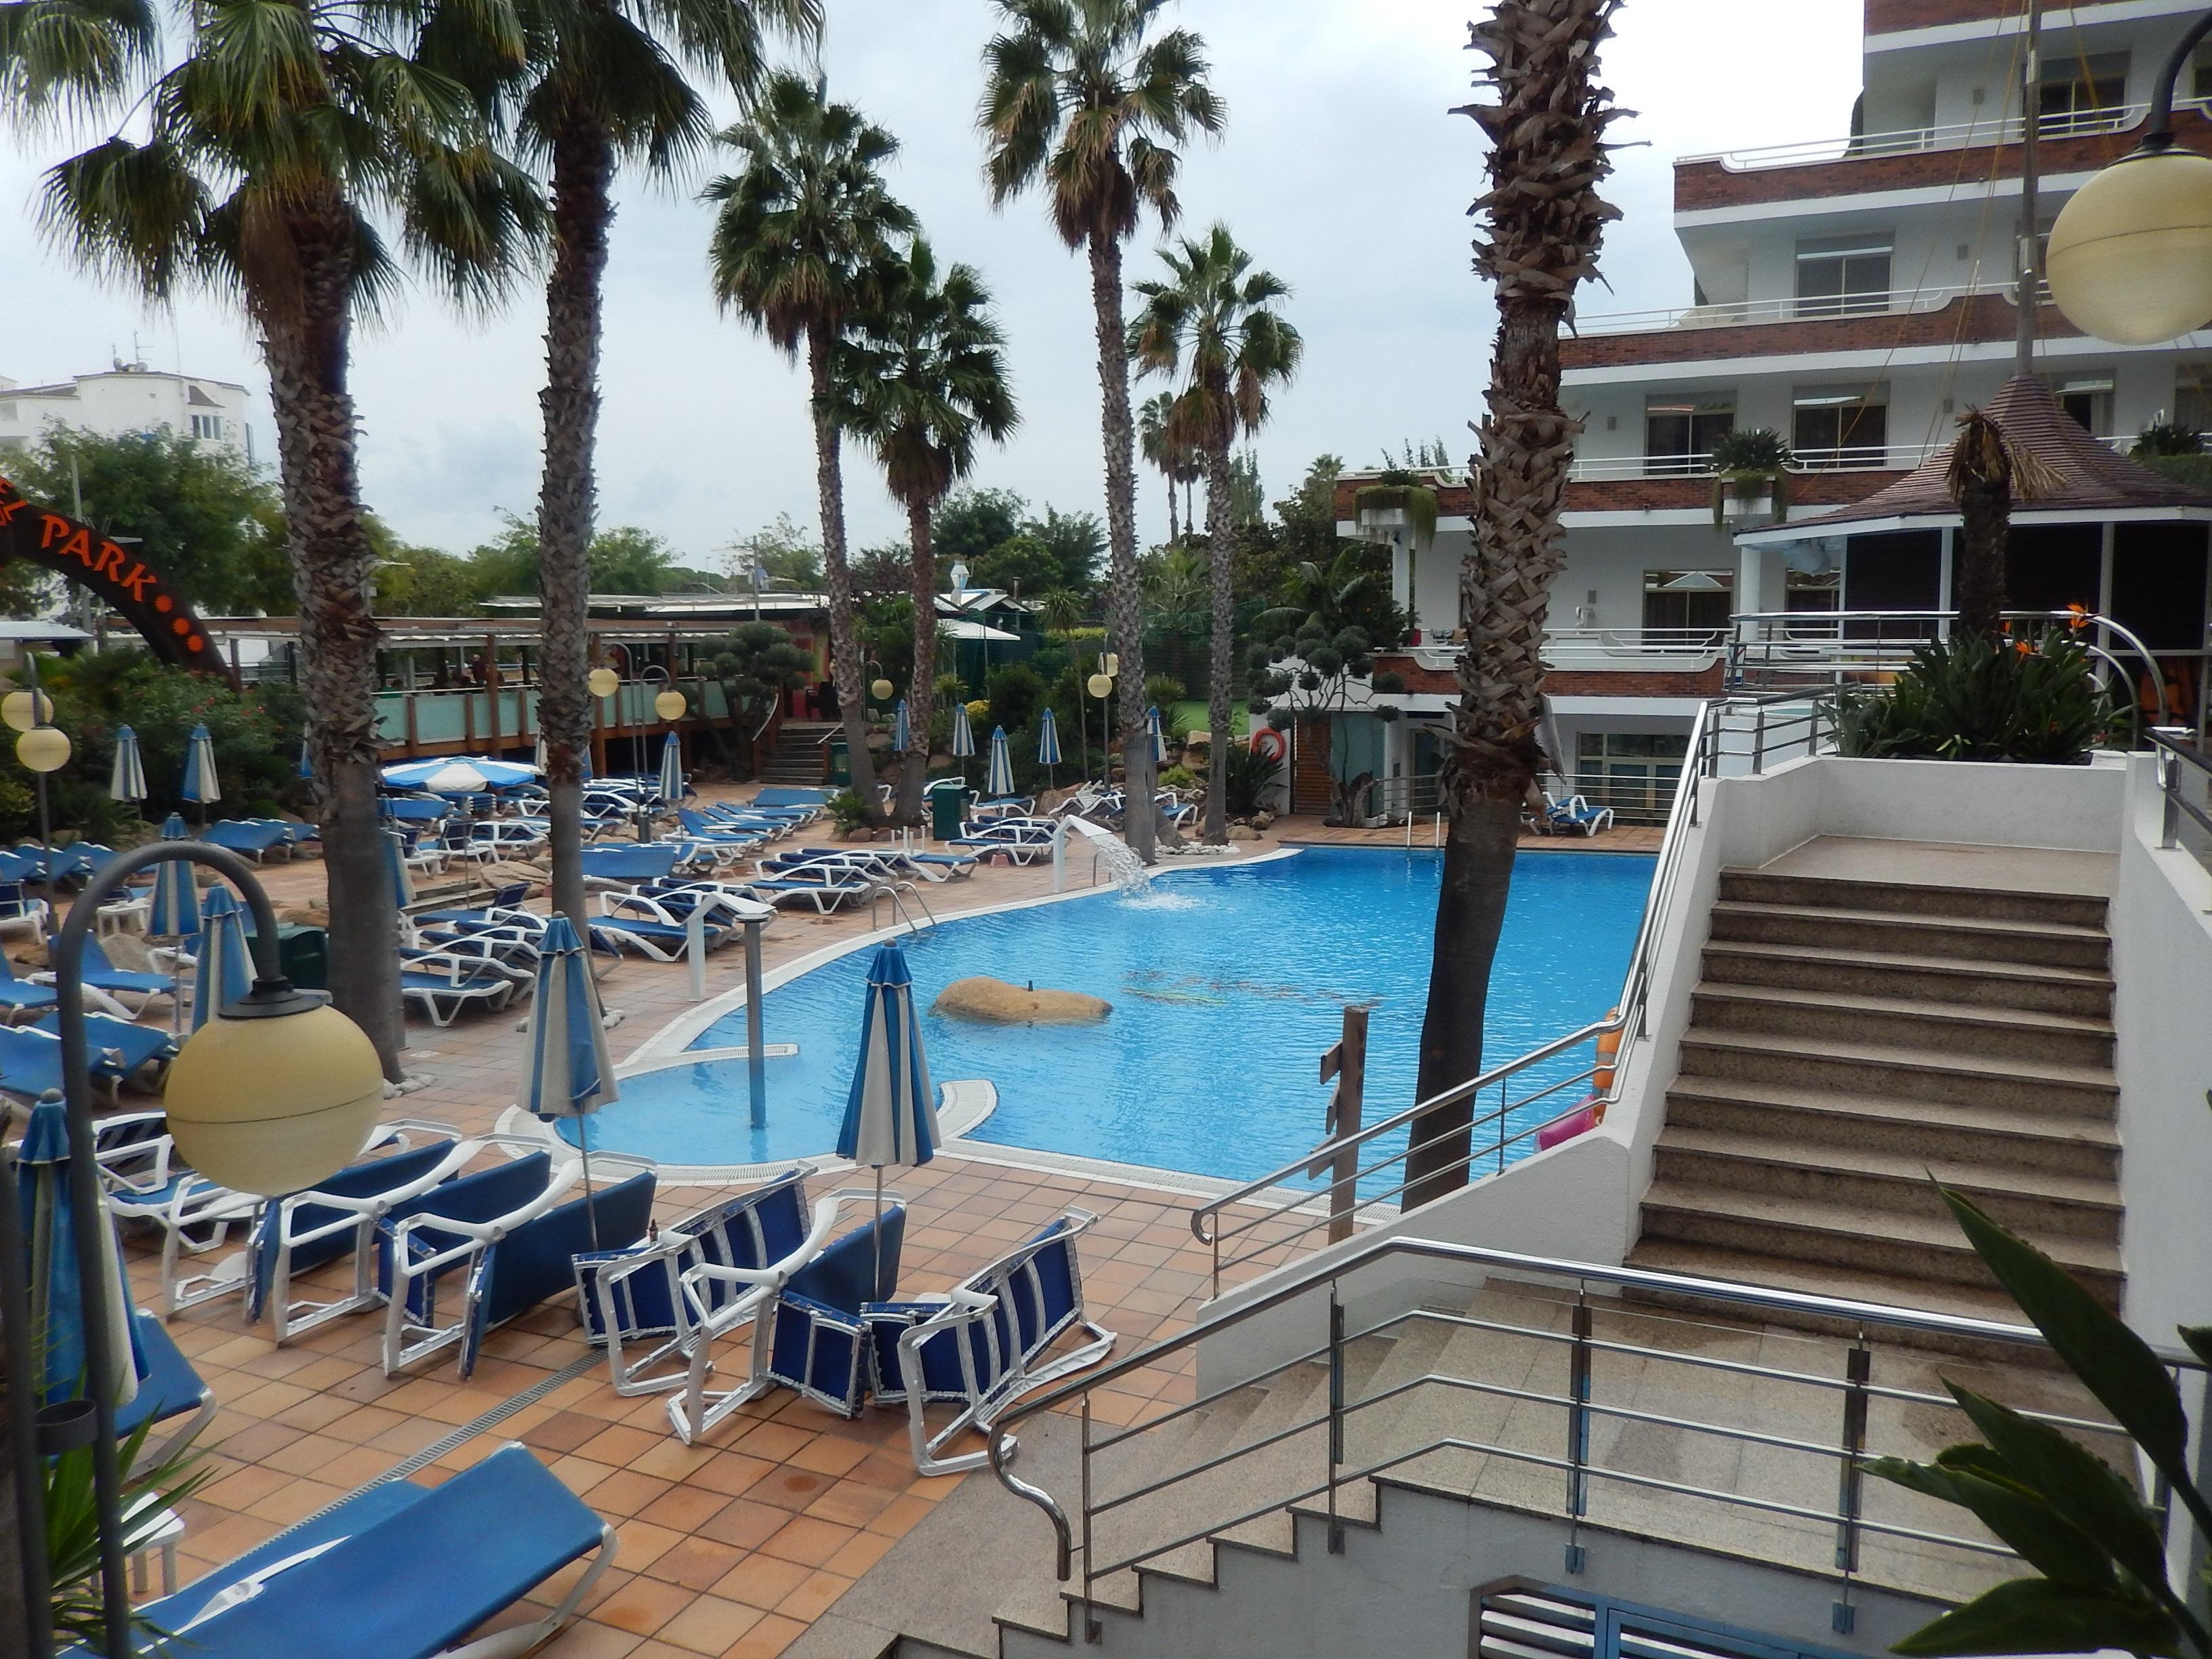 Dock Villa Summer Swimming Pool Holiday Property Marina Leisure Apartment  Spain Luxury Hotel Resort Estate Condominium